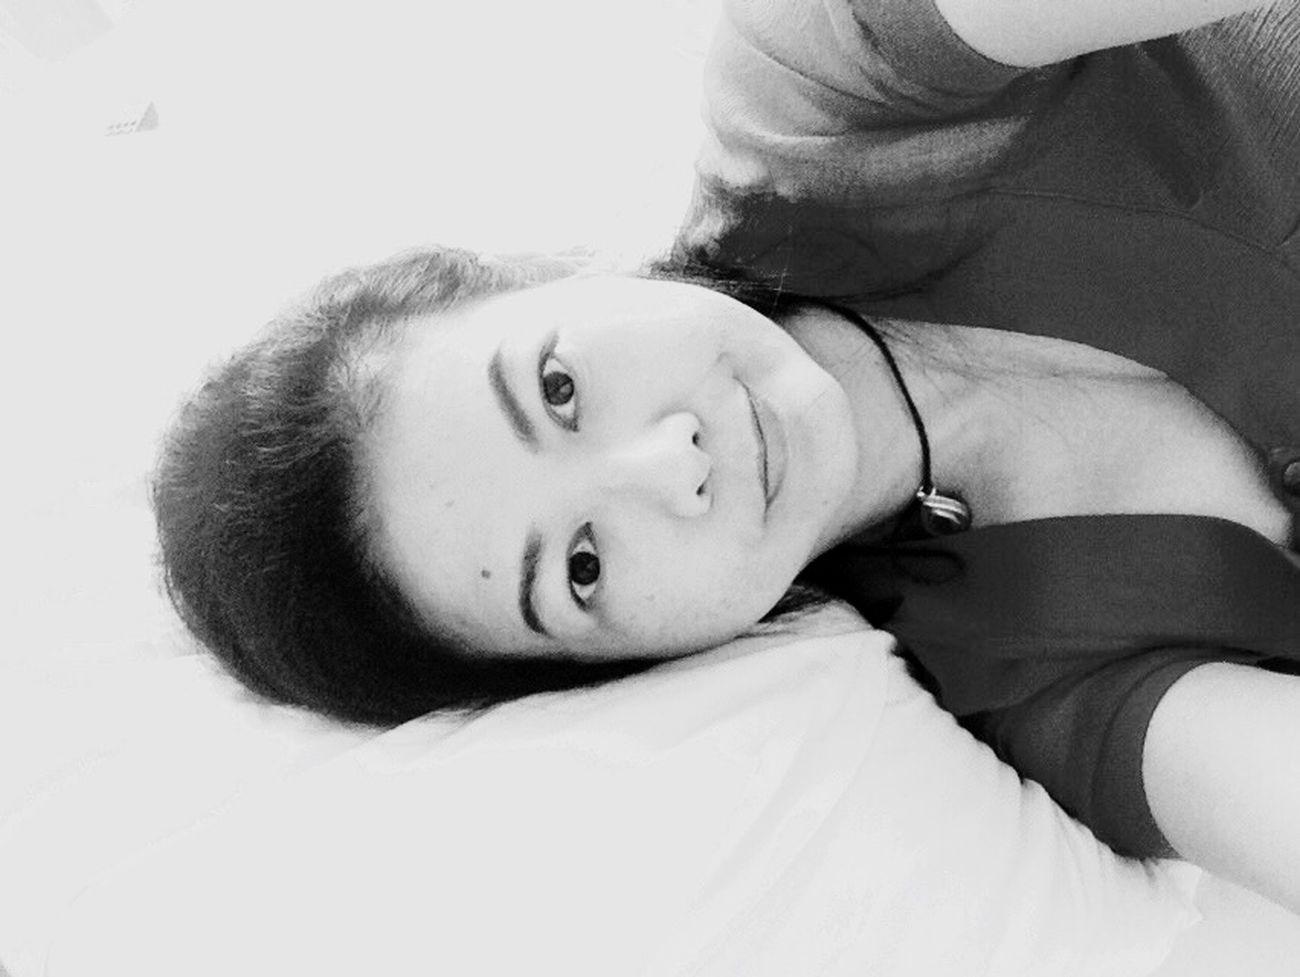 Goodnight Goodbye Goodluck ...👋🏼👋🏼👋🏼👋🏼👋🏼👋🏼👋🏼👋🏼... Ampai Jangbumrung 🏌